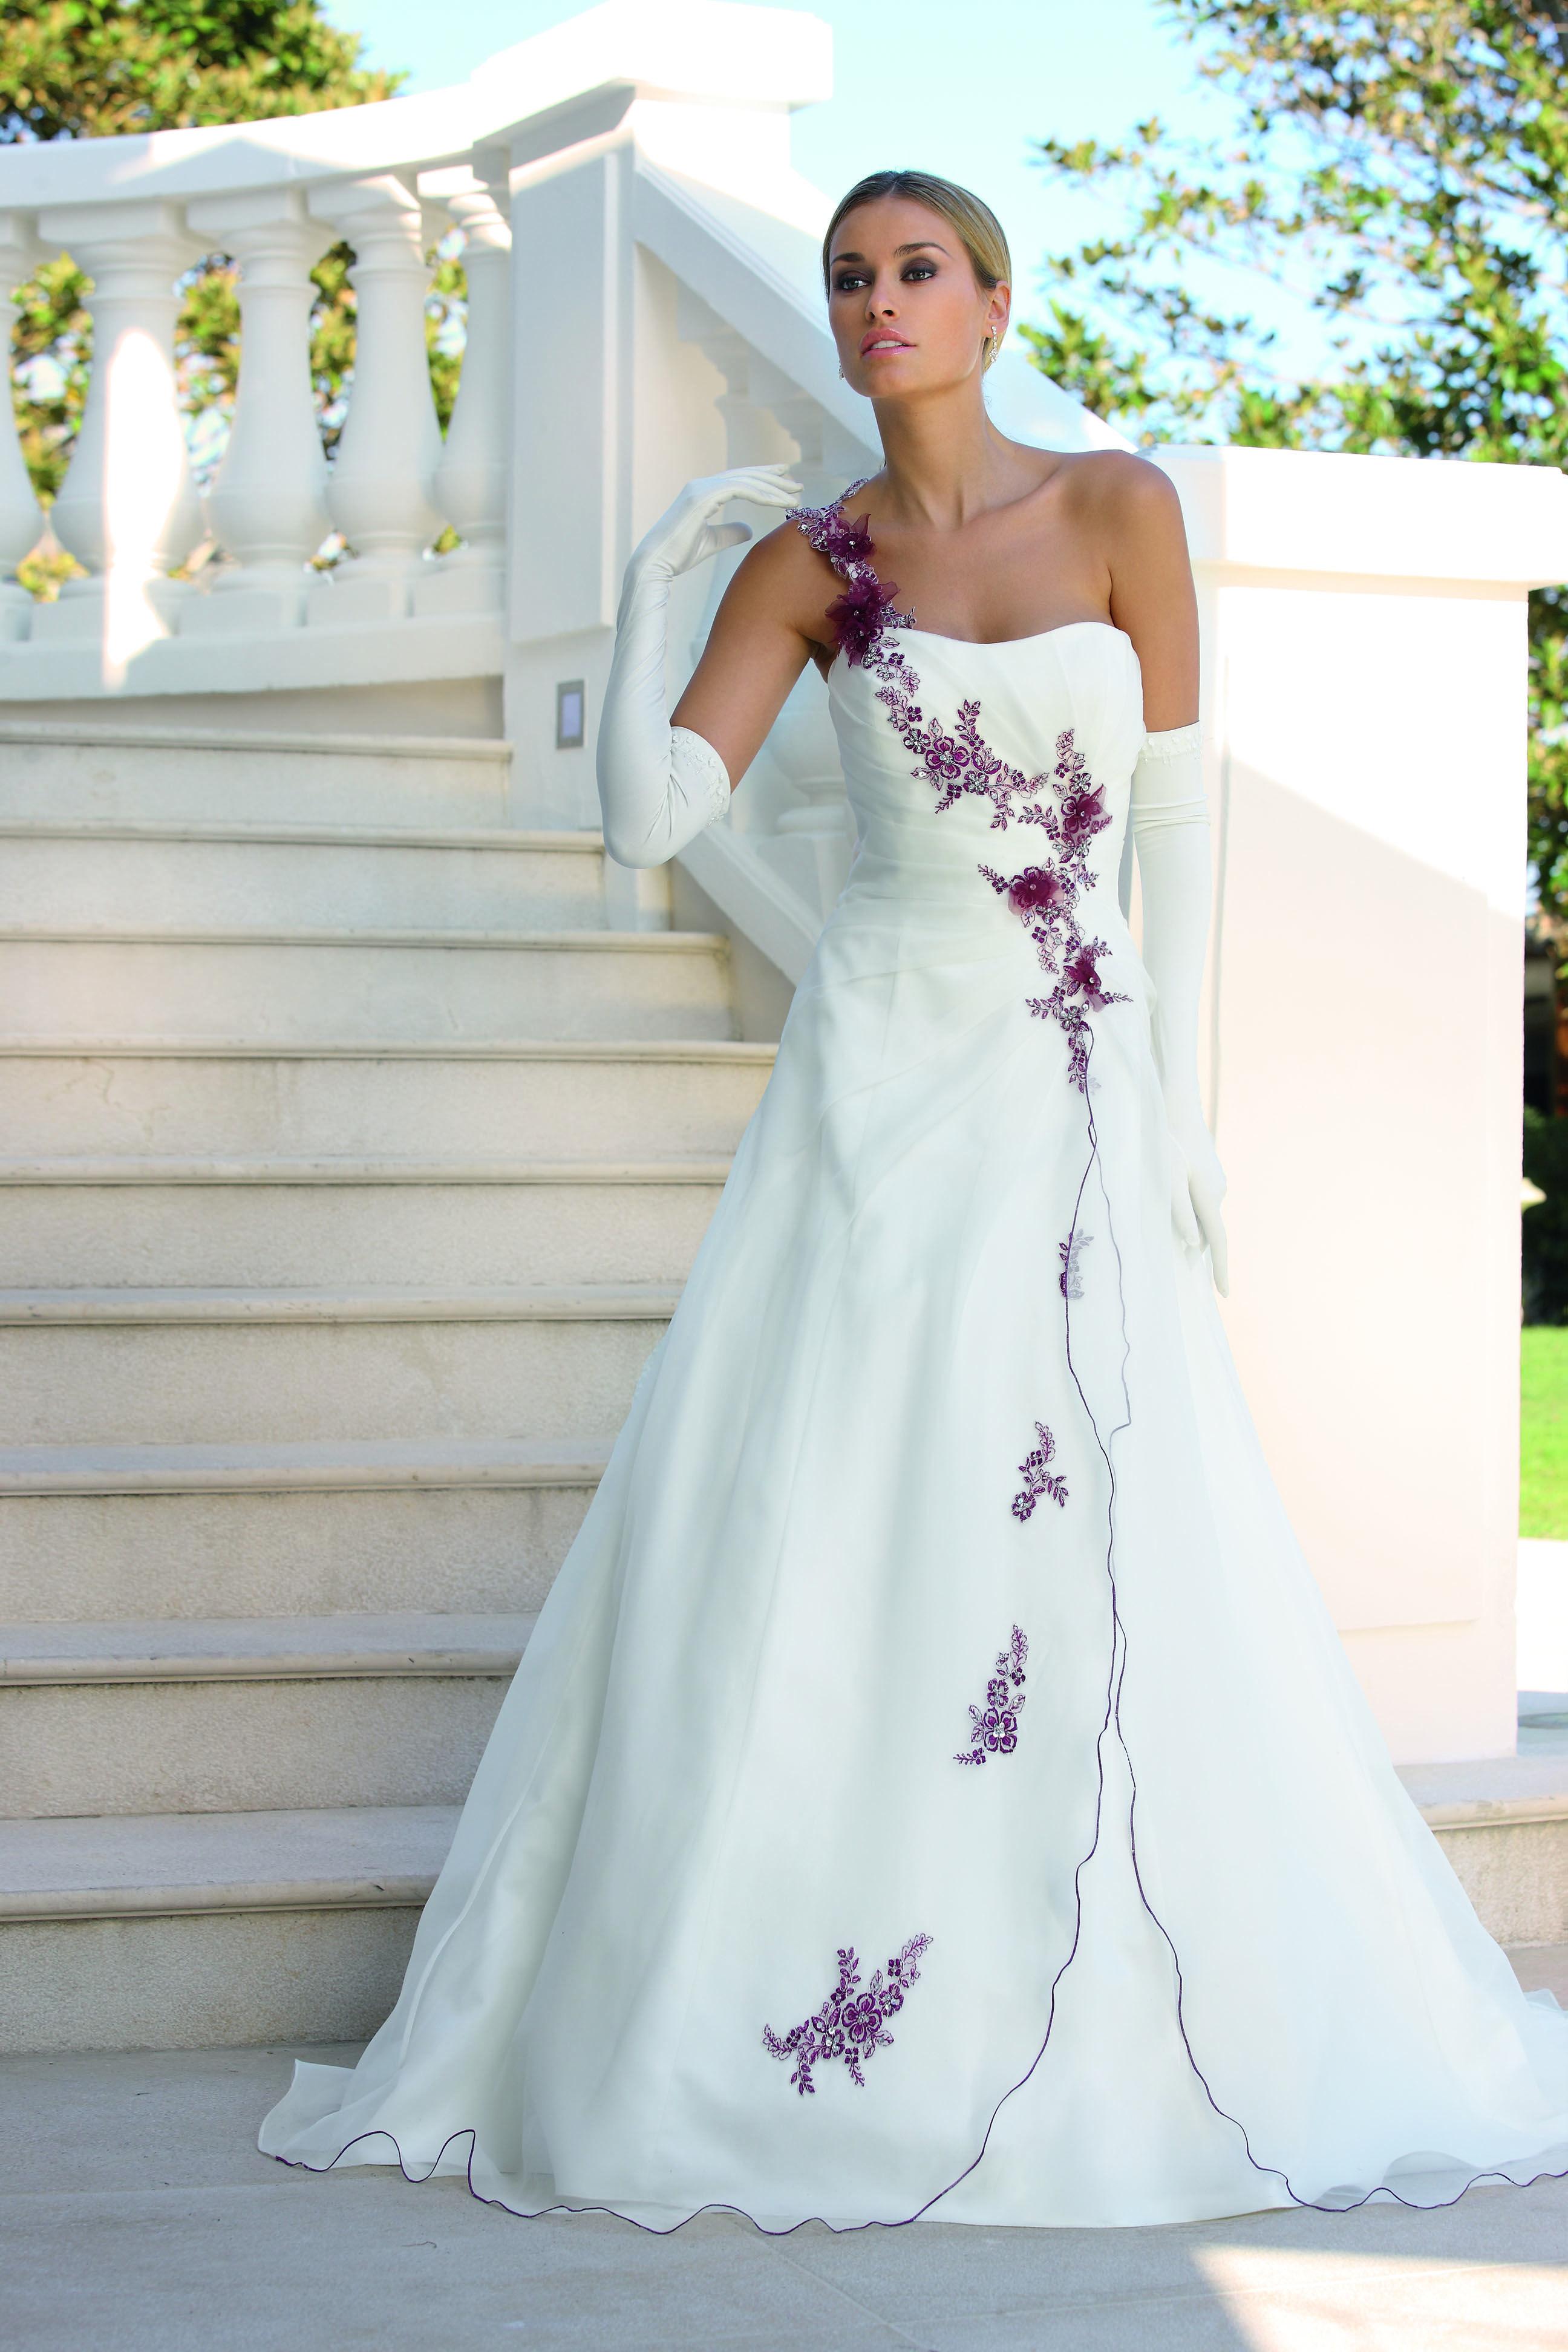 Ladybird Wedding Dress style 33000 Ivory-Burgundy-Silver | wedding ...